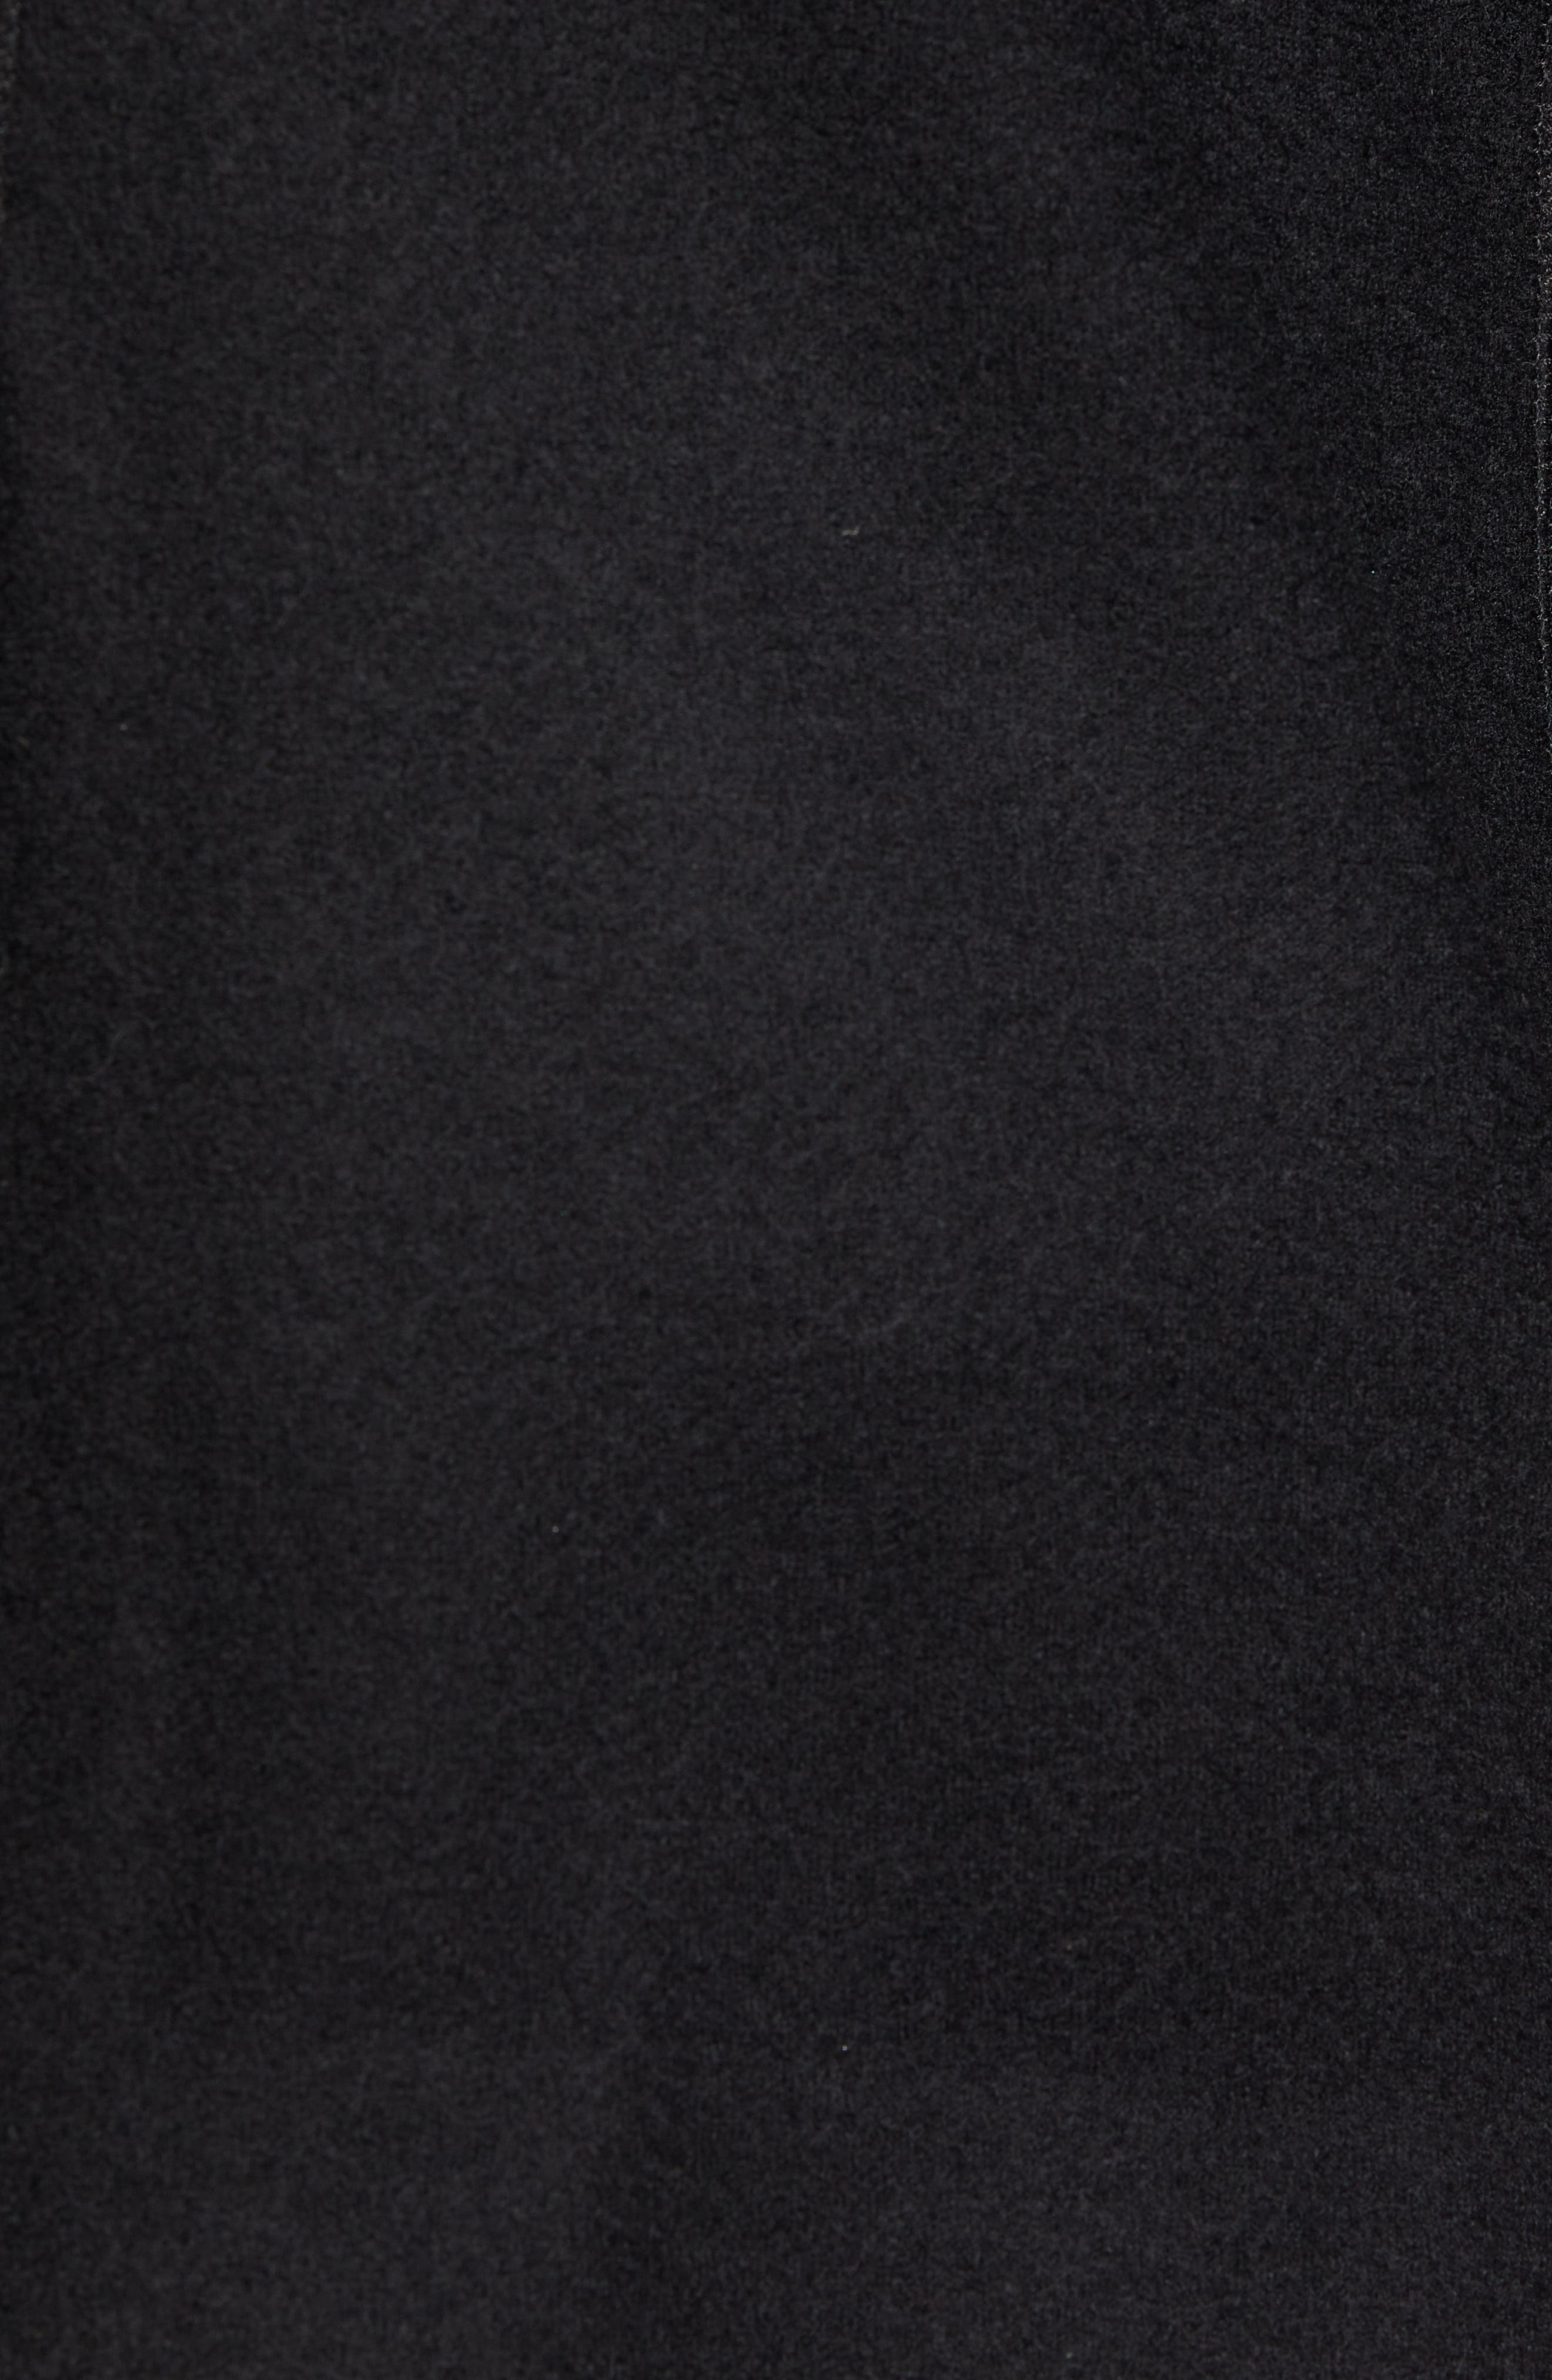 Deconstructed Razor Slim Fit Wool Jacket,                             Alternate thumbnail 6, color,                             BLACK